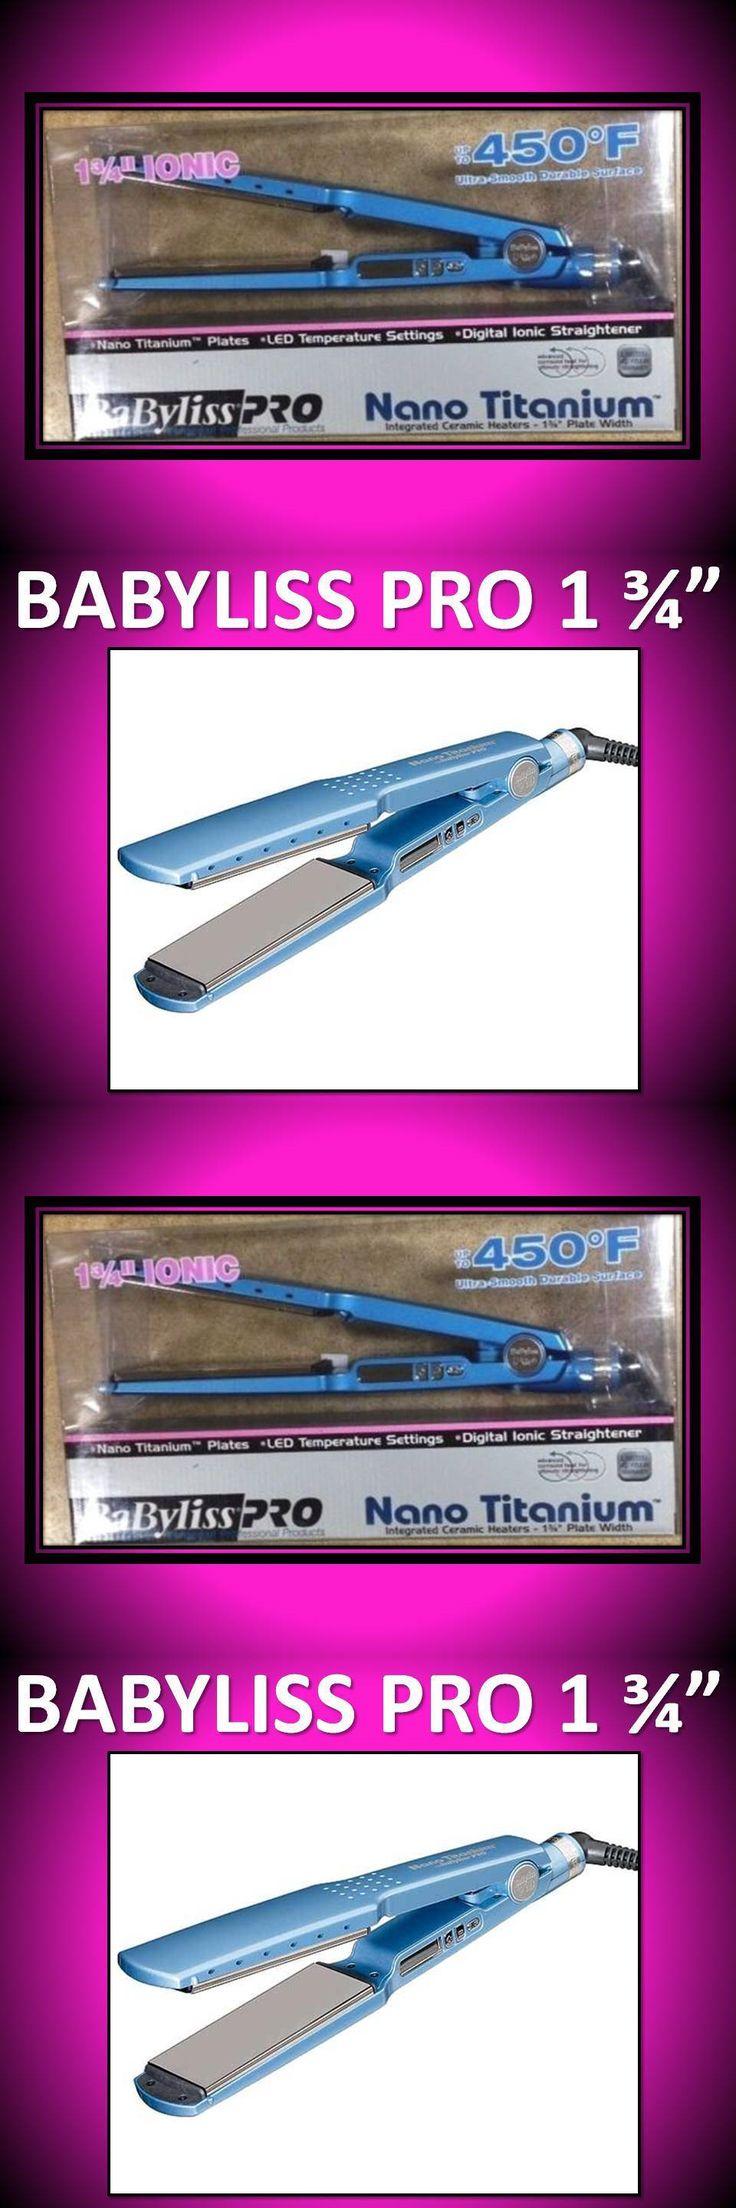 Hair Beauty: Babyliss Pro Nano Titanium 450° Led 1 3/4 Hair Straightener Flat Iron Babnt2094 BUY IT NOW ONLY: $92.76